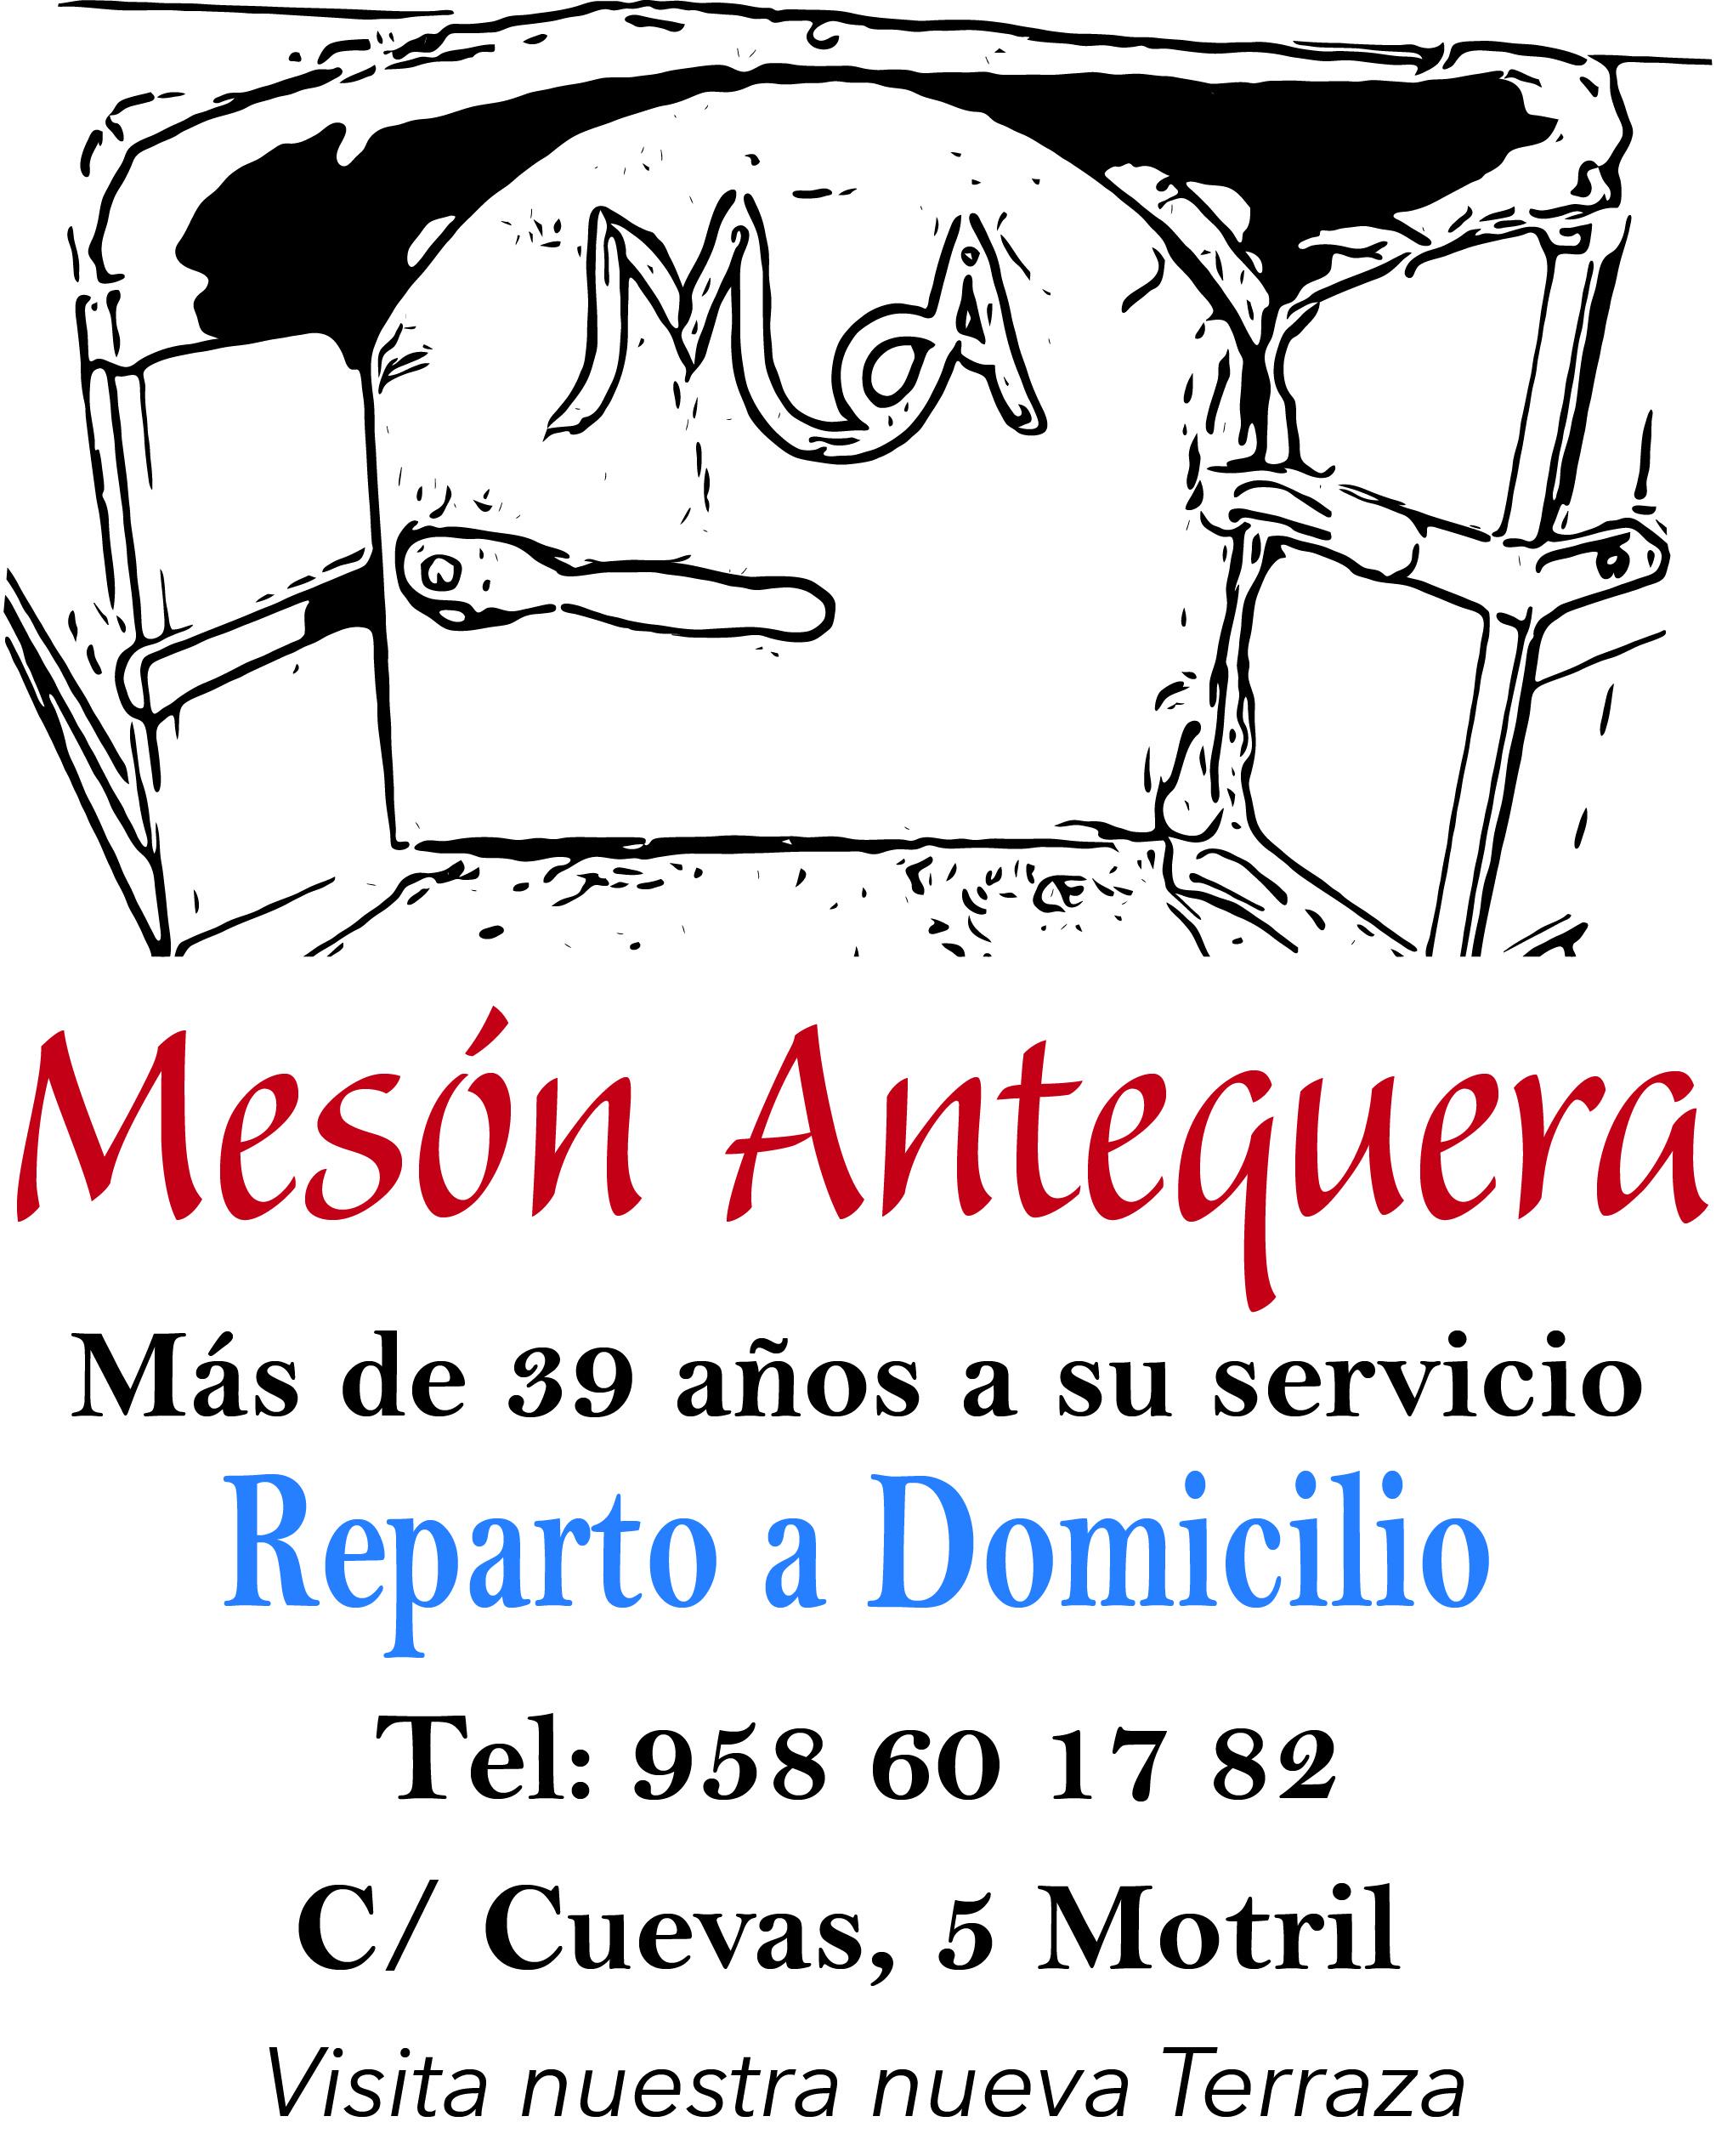 MESON ANTEQUERA